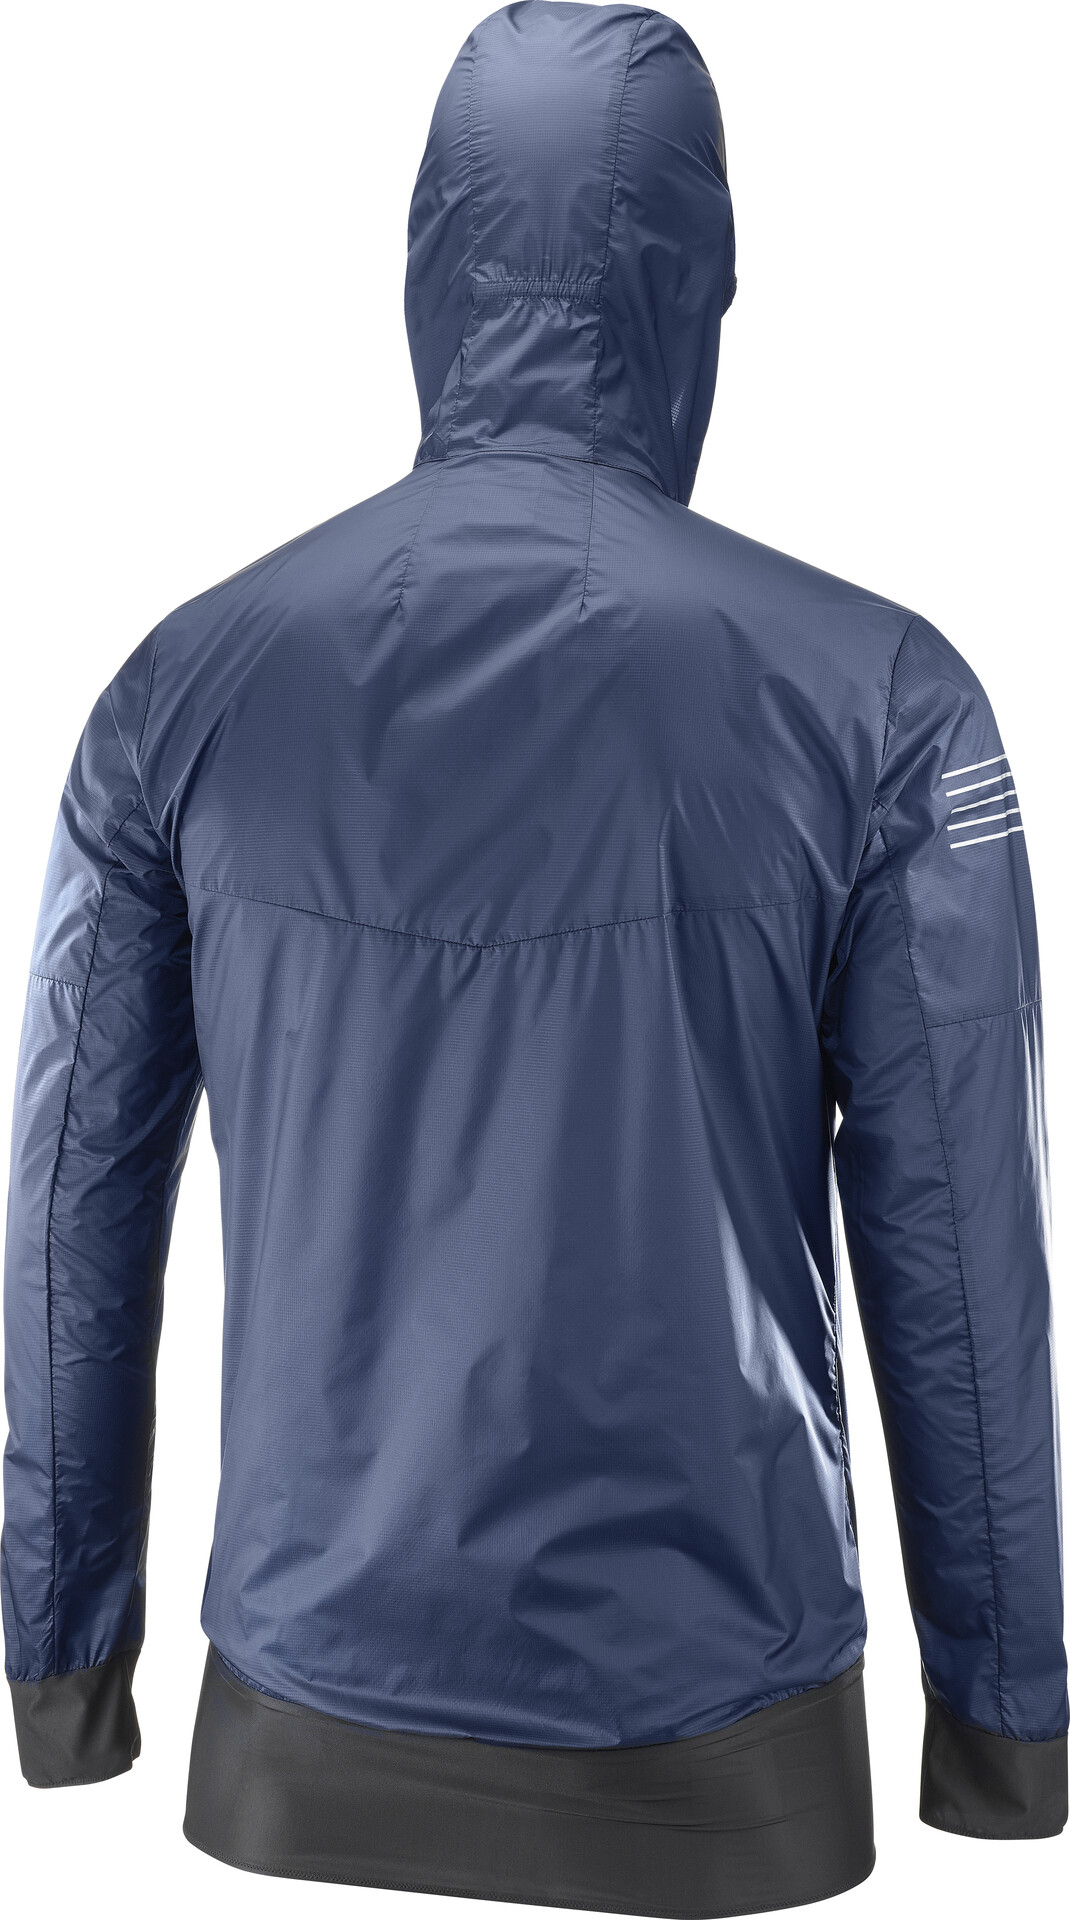 Chaqueta Campz Azul Hybrid es Hombre Salomon Fast Running Wing OPwffqH